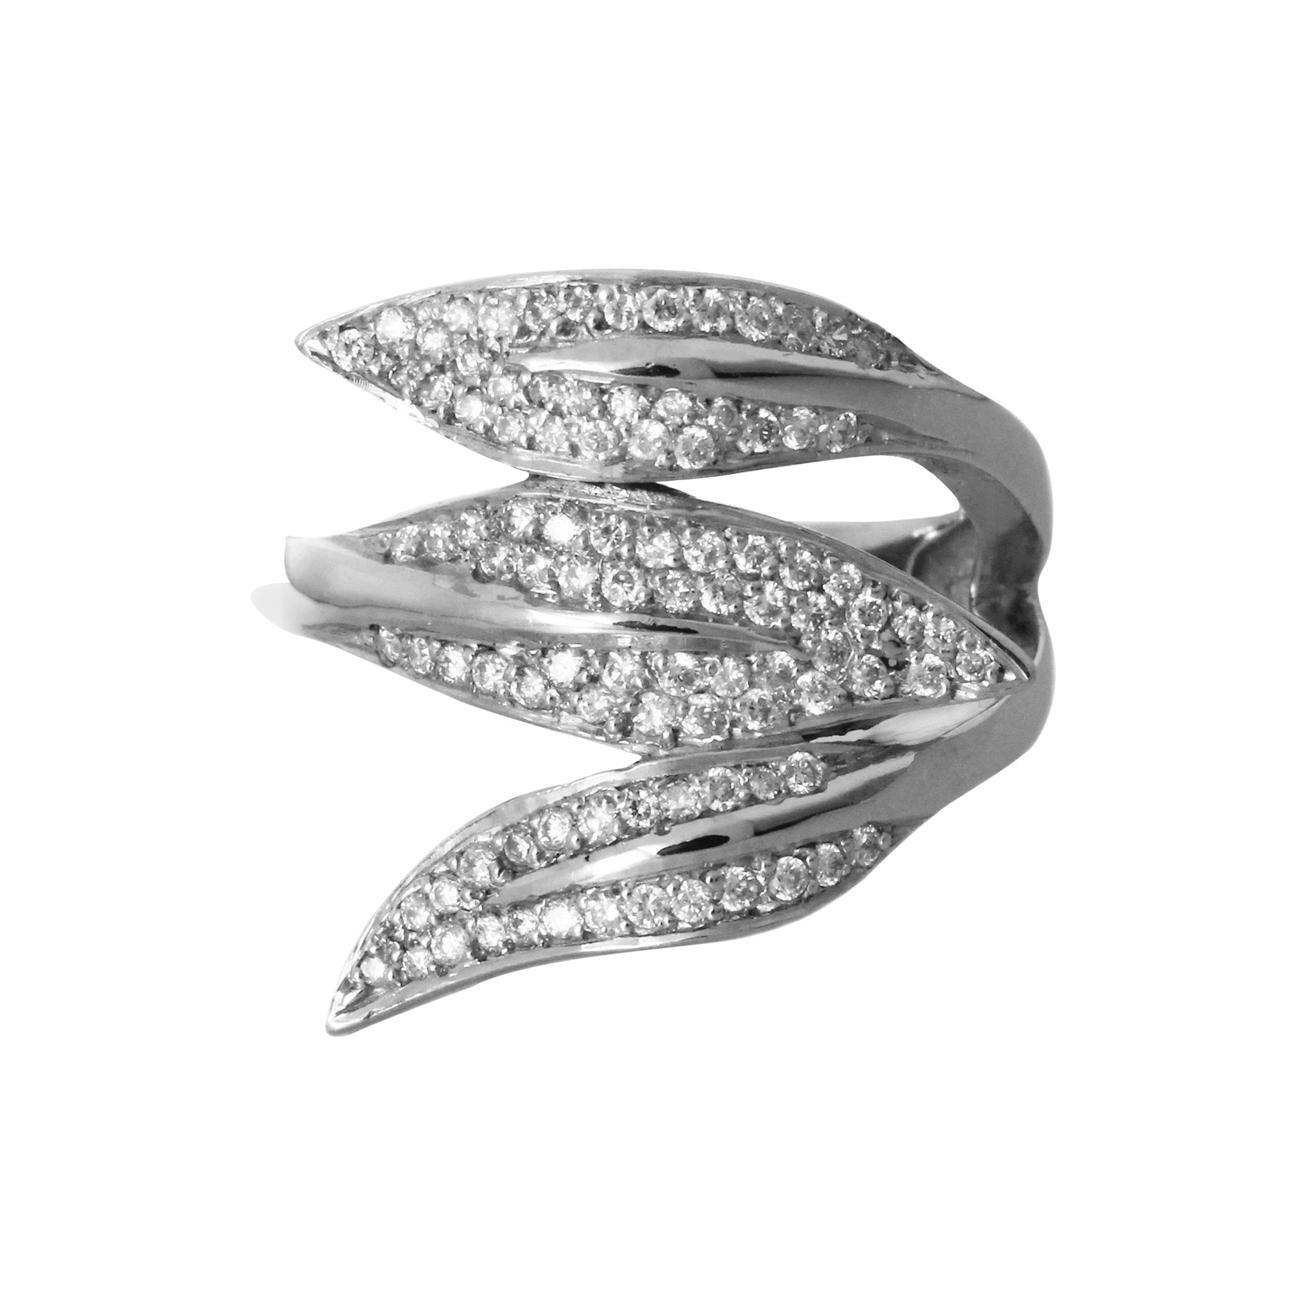 18 Karat White Gold and Diamonds Ring